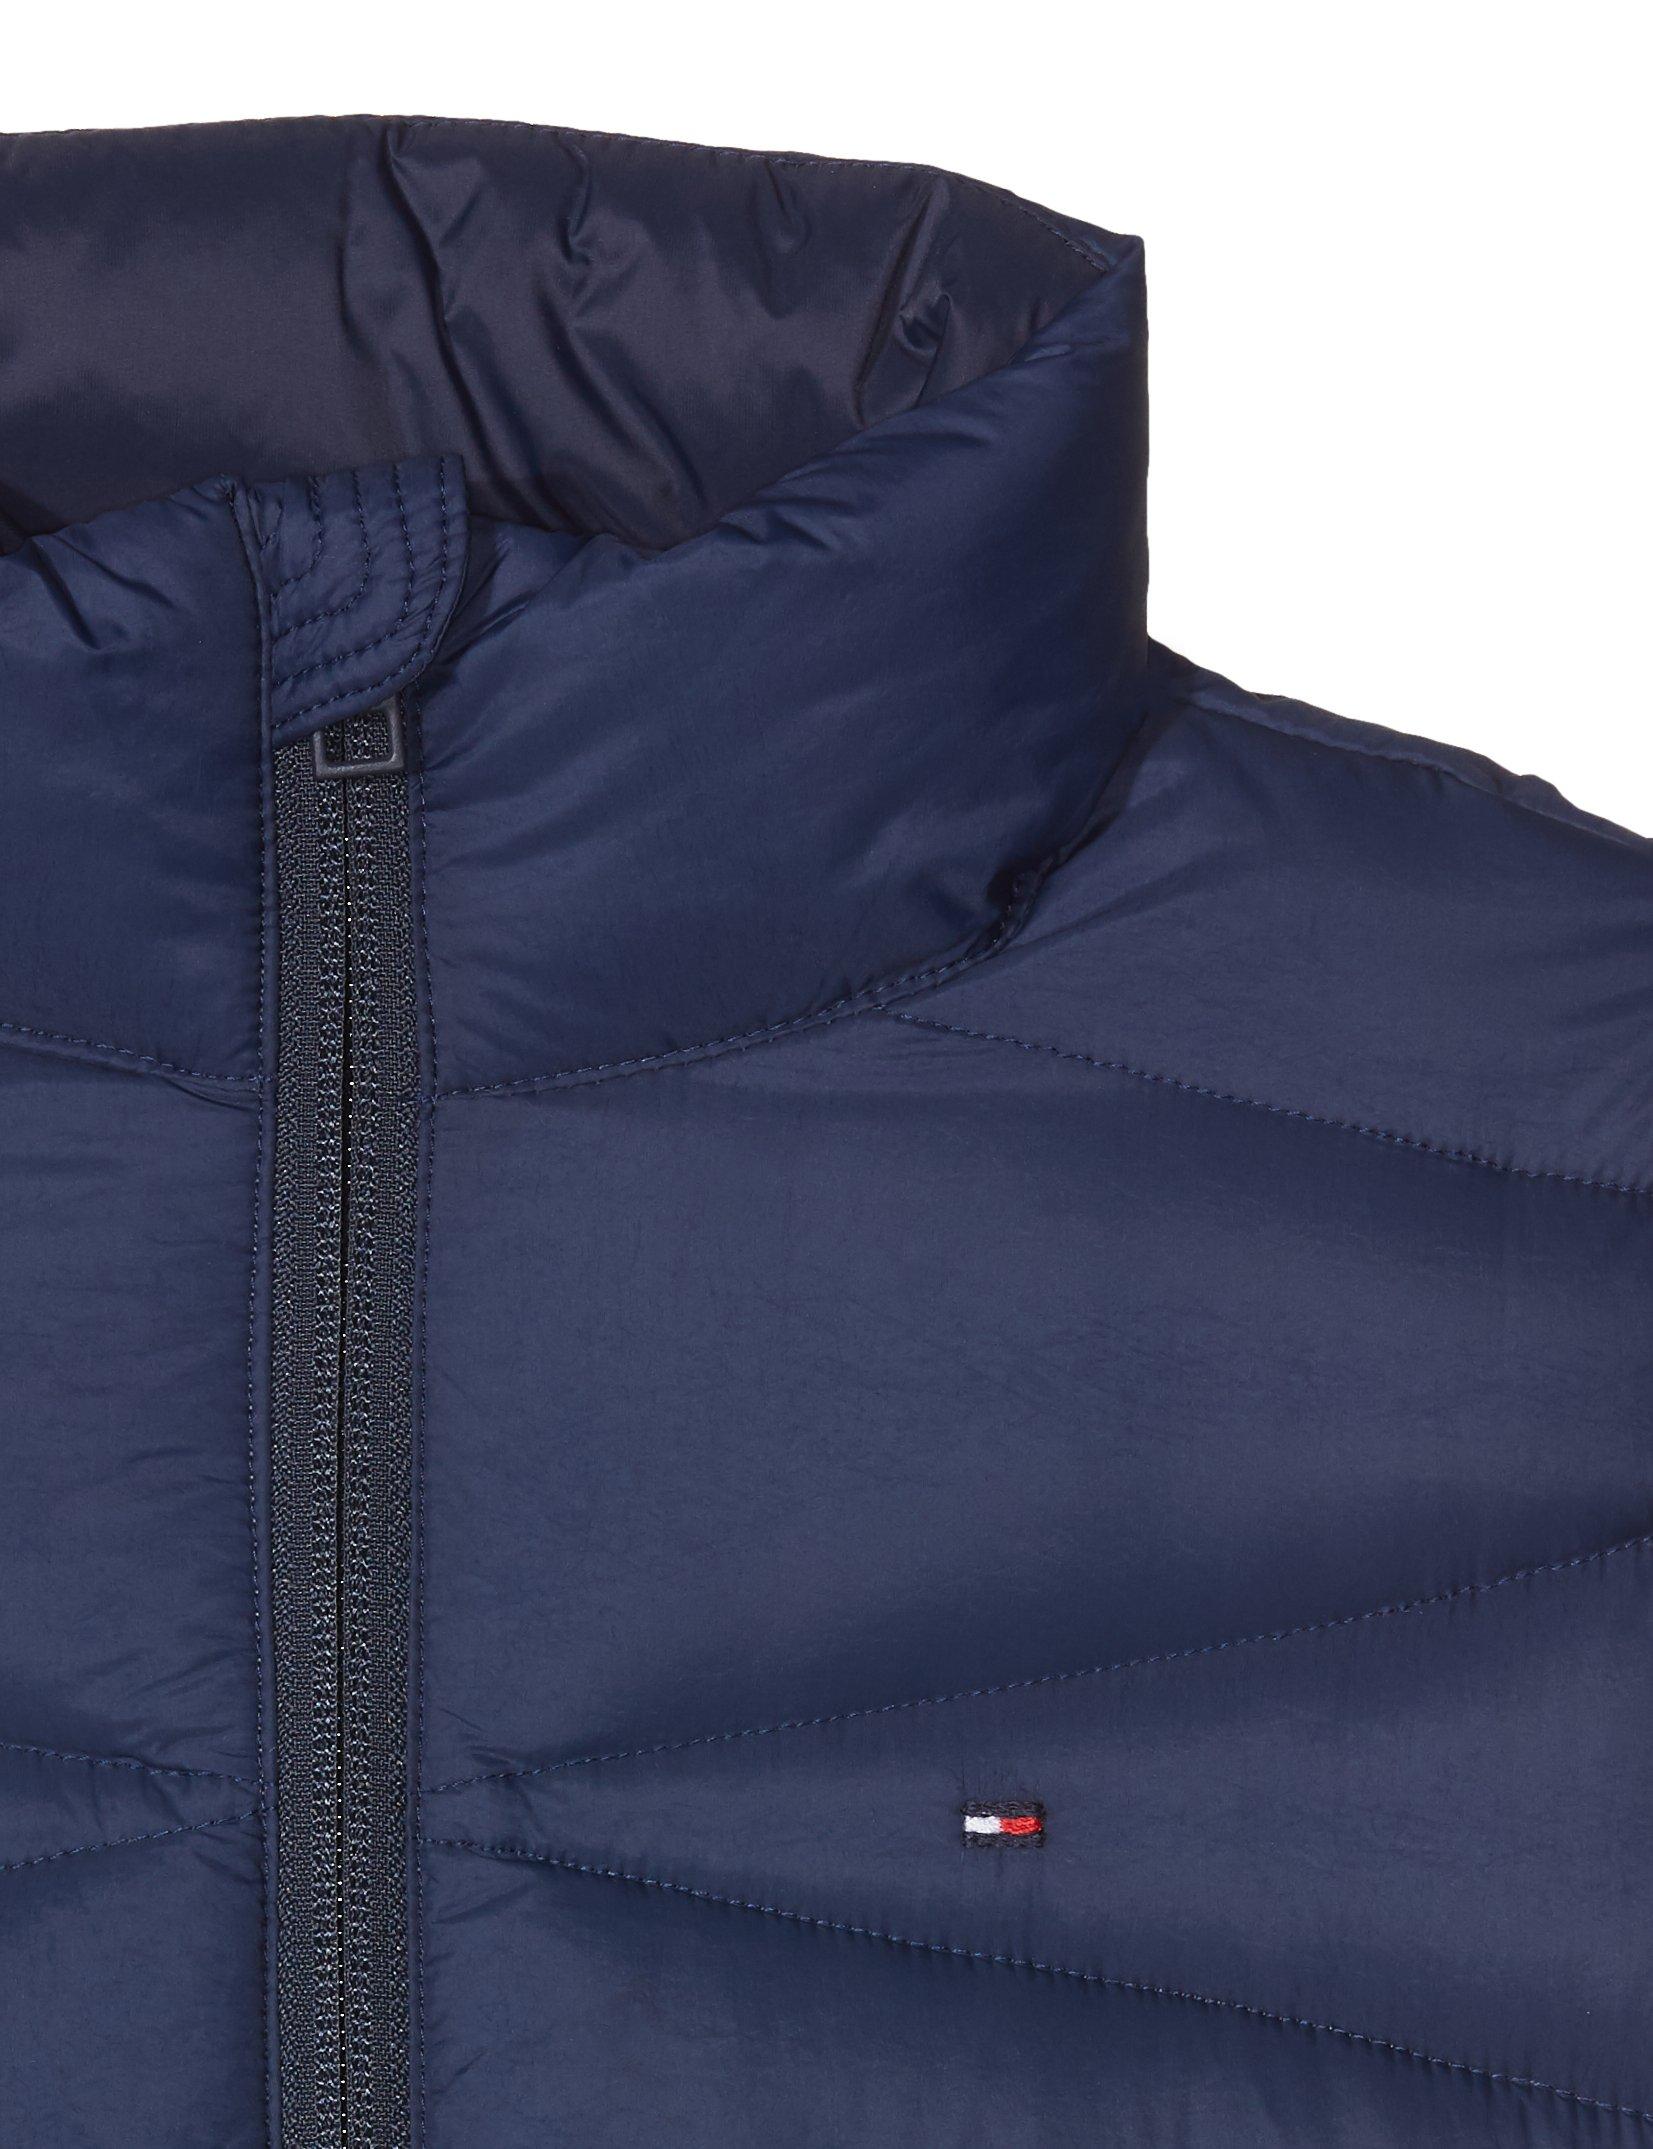 Tommy Hilfiger Packable Light Down Vest Chaqueta para Niños